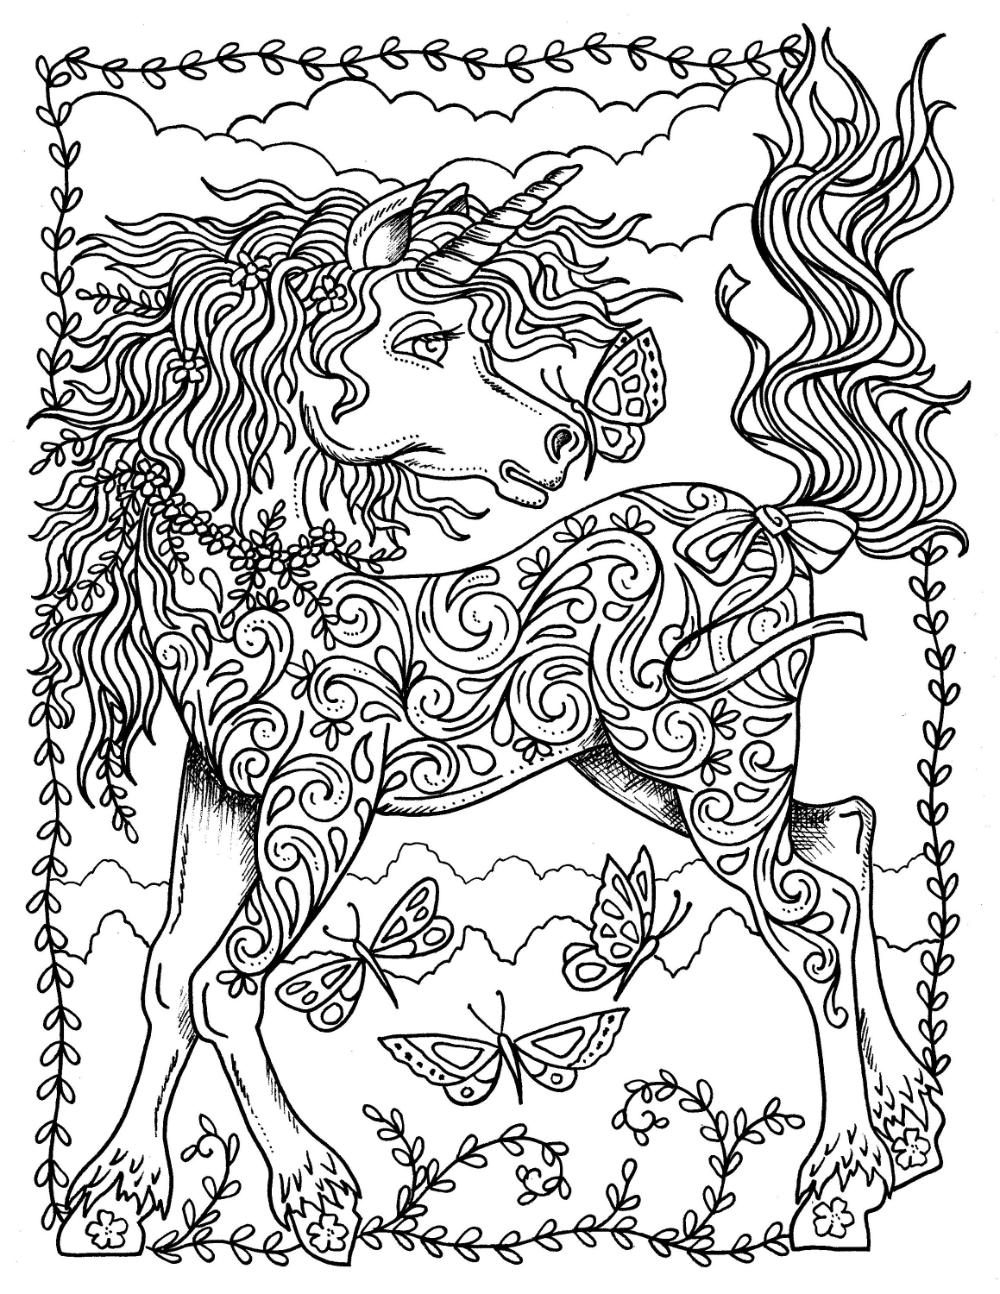 Digital Coloring Book Unicorn Dreams Magical Fantasy Etsy Unicorn Coloring Pages Coloring Books Horse Coloring Books